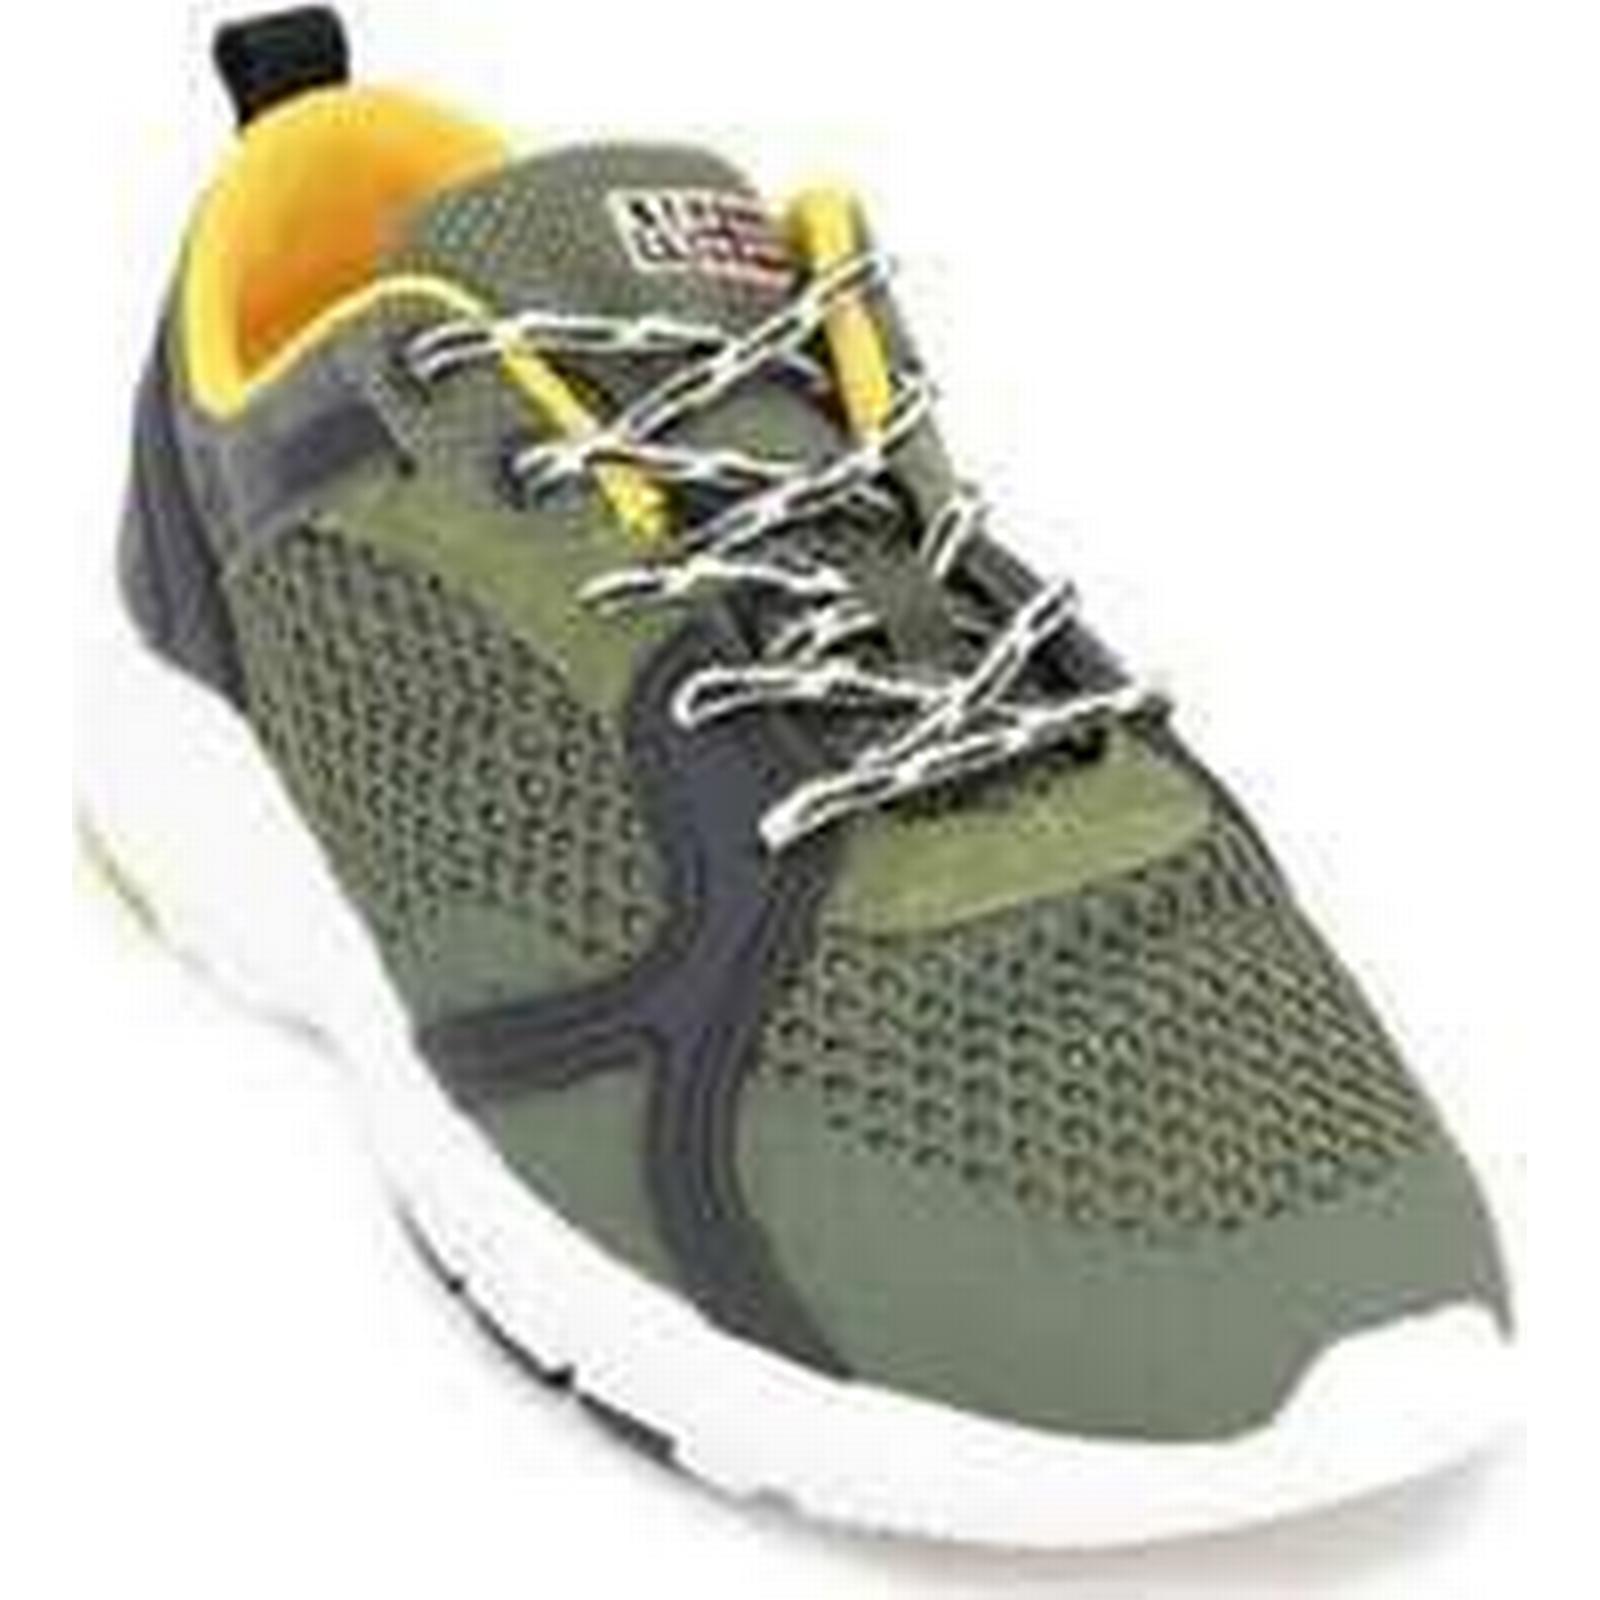 Spartoo.co.uk Napapijri Optima Shoes 16833616 Men's Sneakers men's Shoes Optima (Trainers) in Green e23405